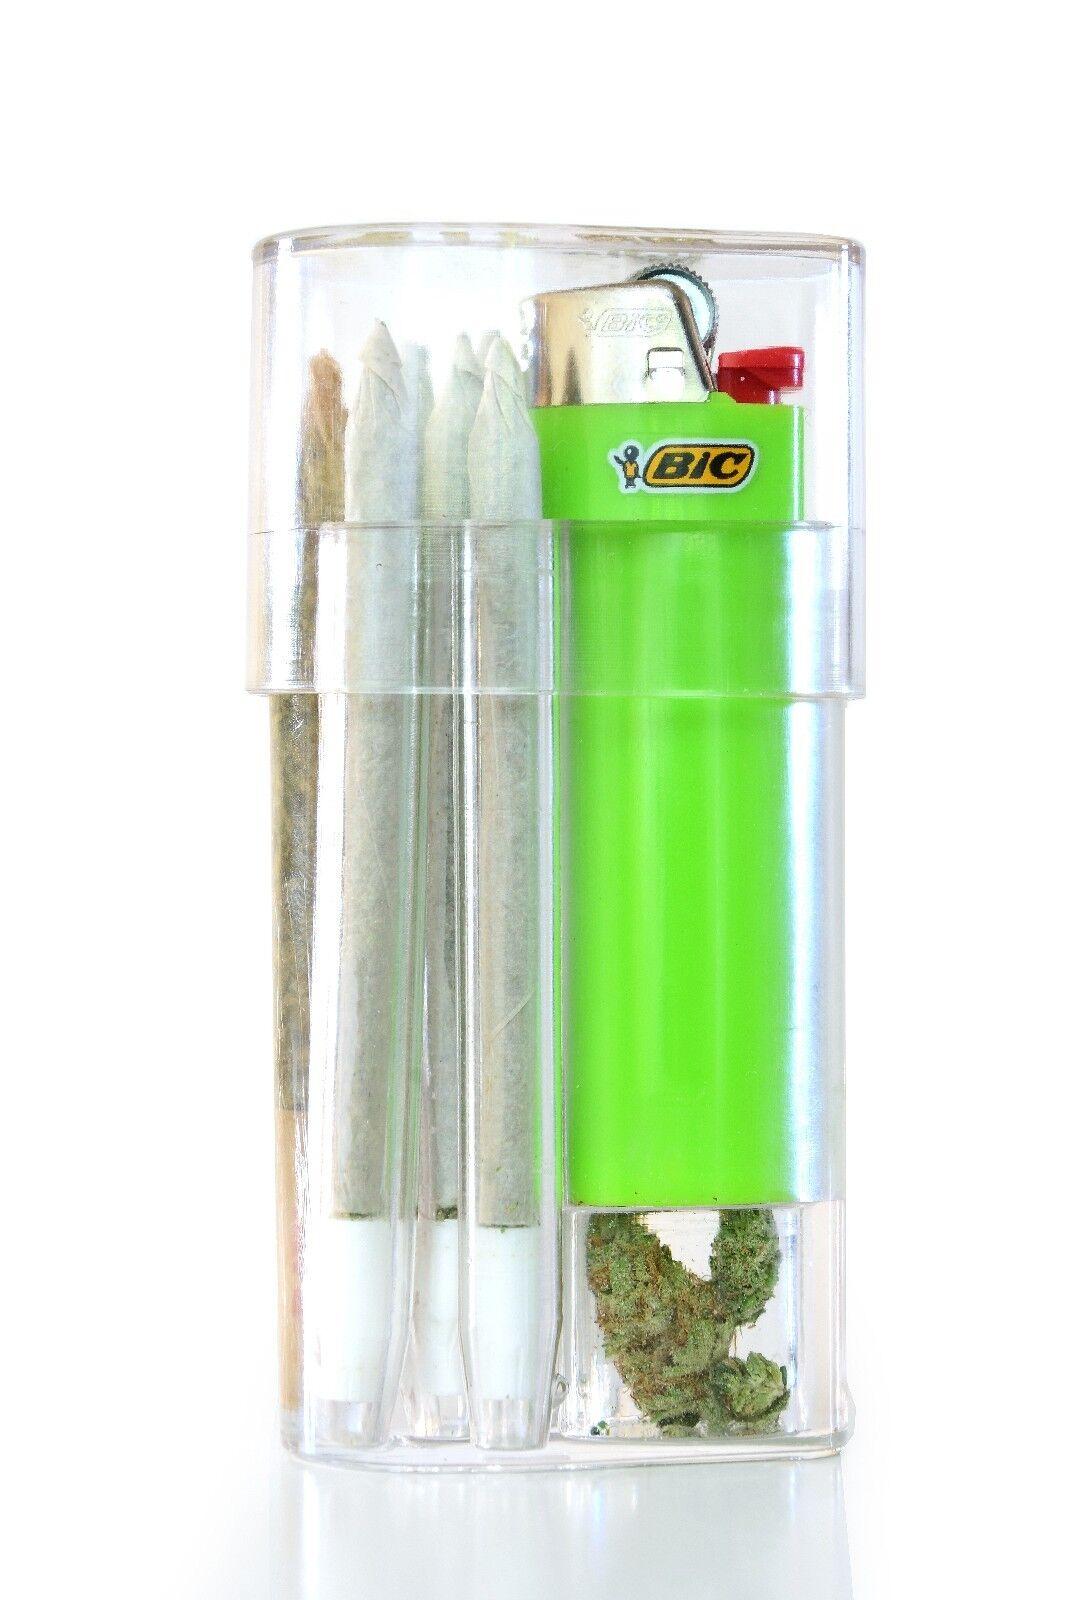 Smoke Space - Cigarette Case - Bic Lighter - Smoking Accesso